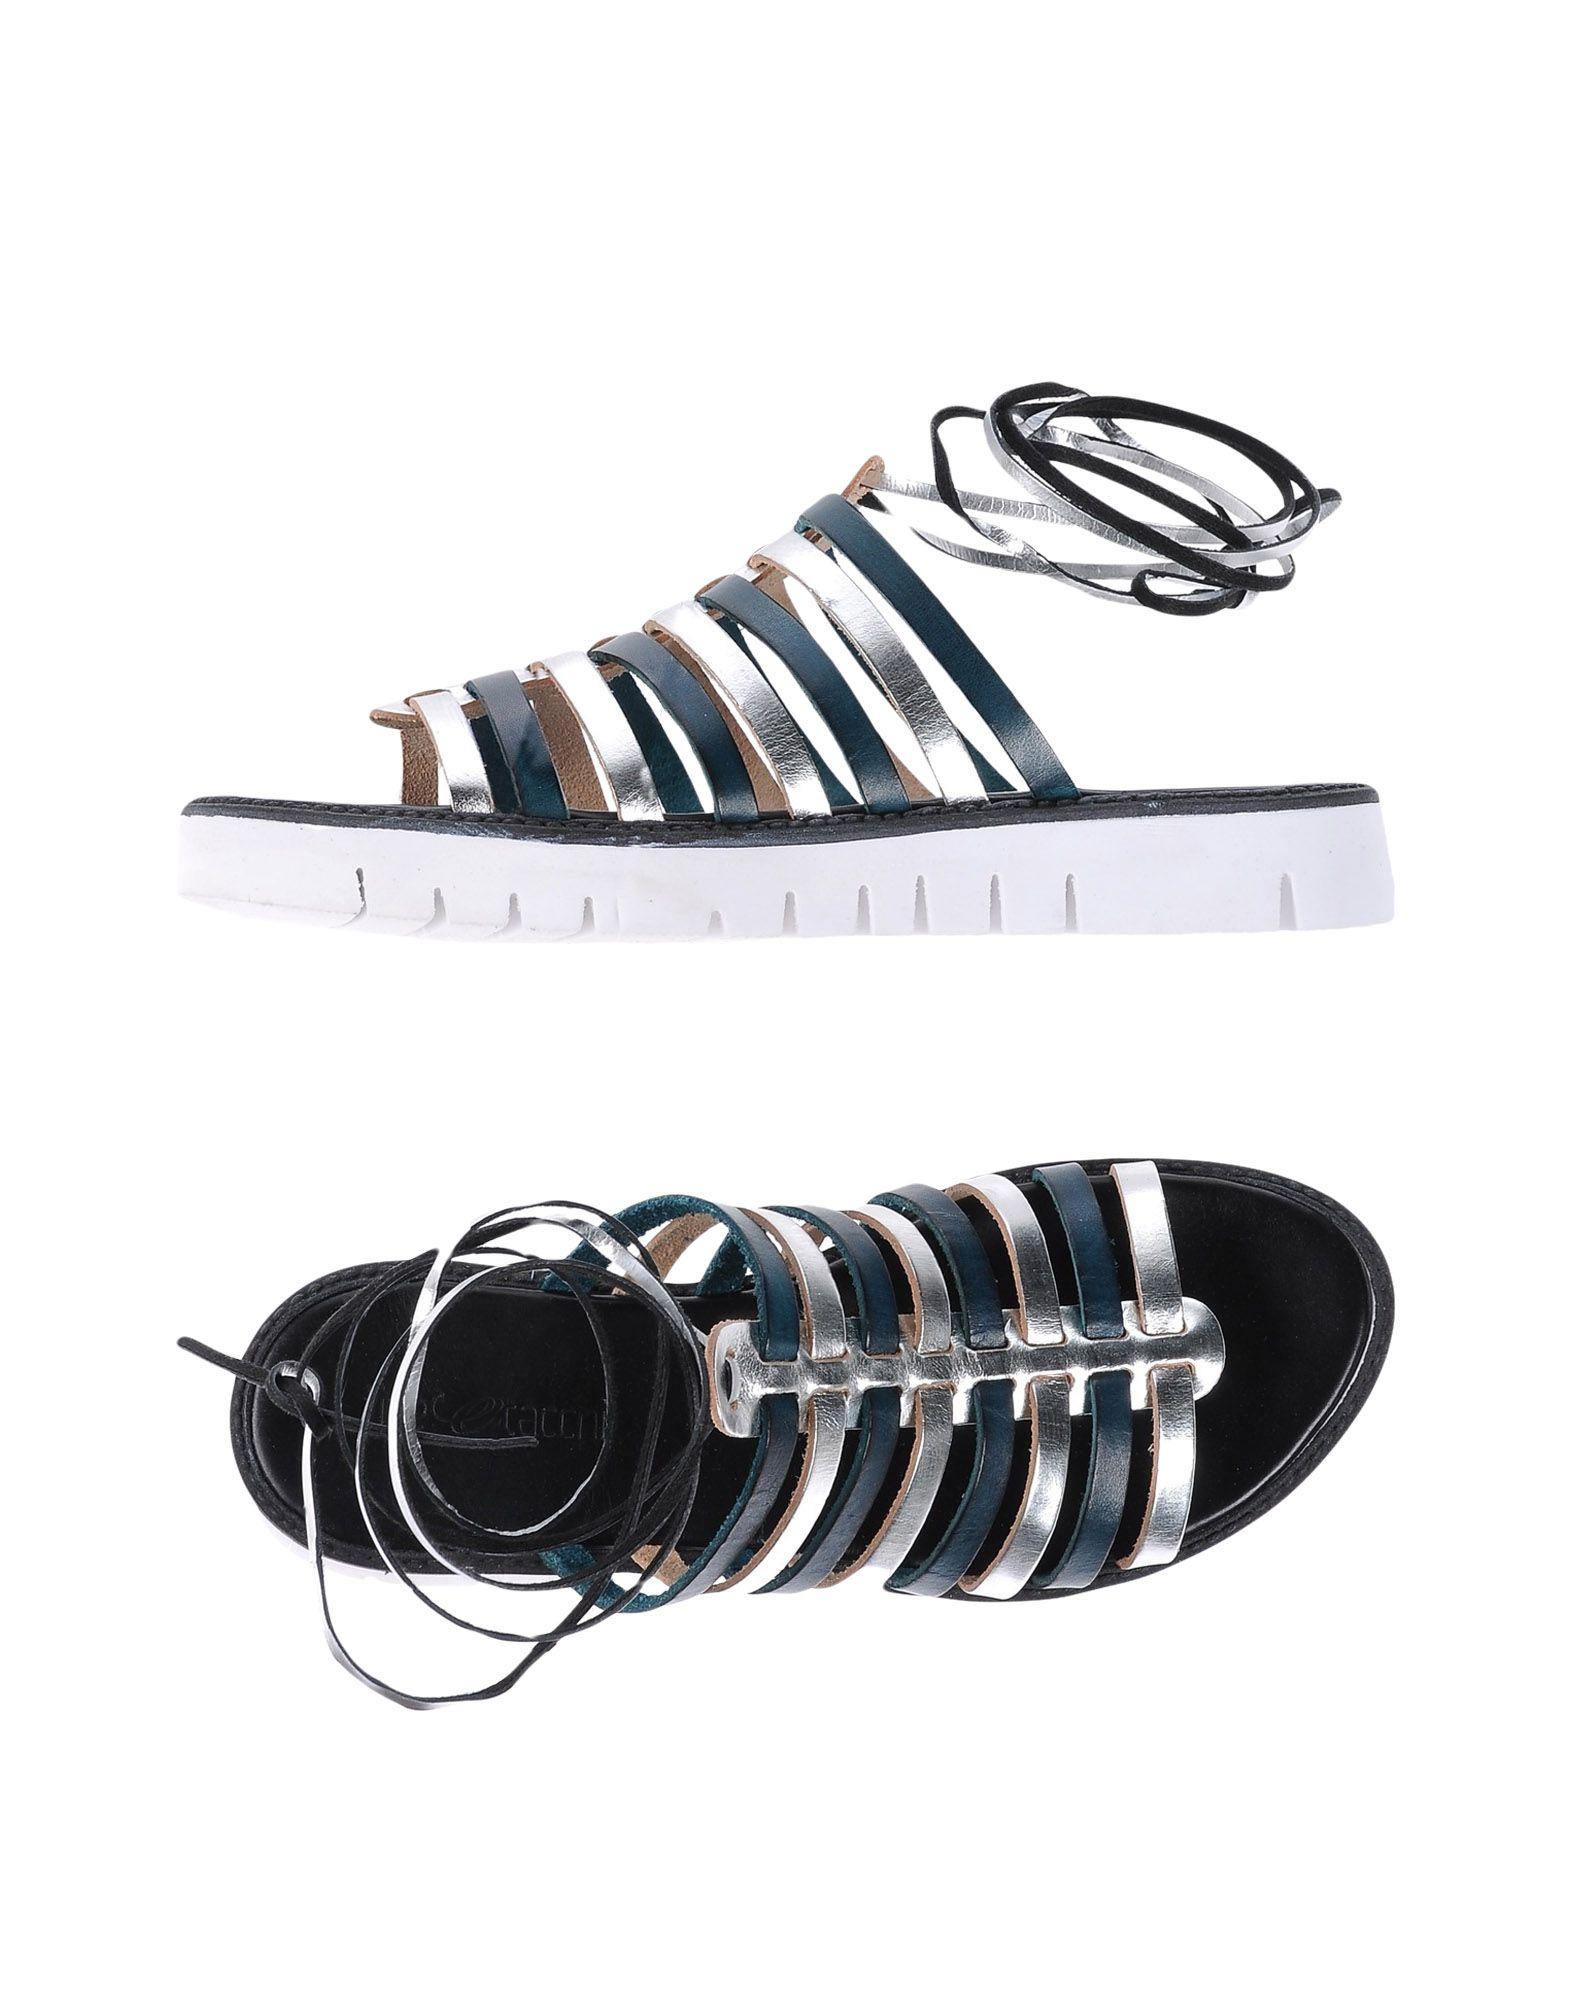 Tipe E Tacchi Sandalen Damen  11152005CP Gute Qualität beliebte Schuhe